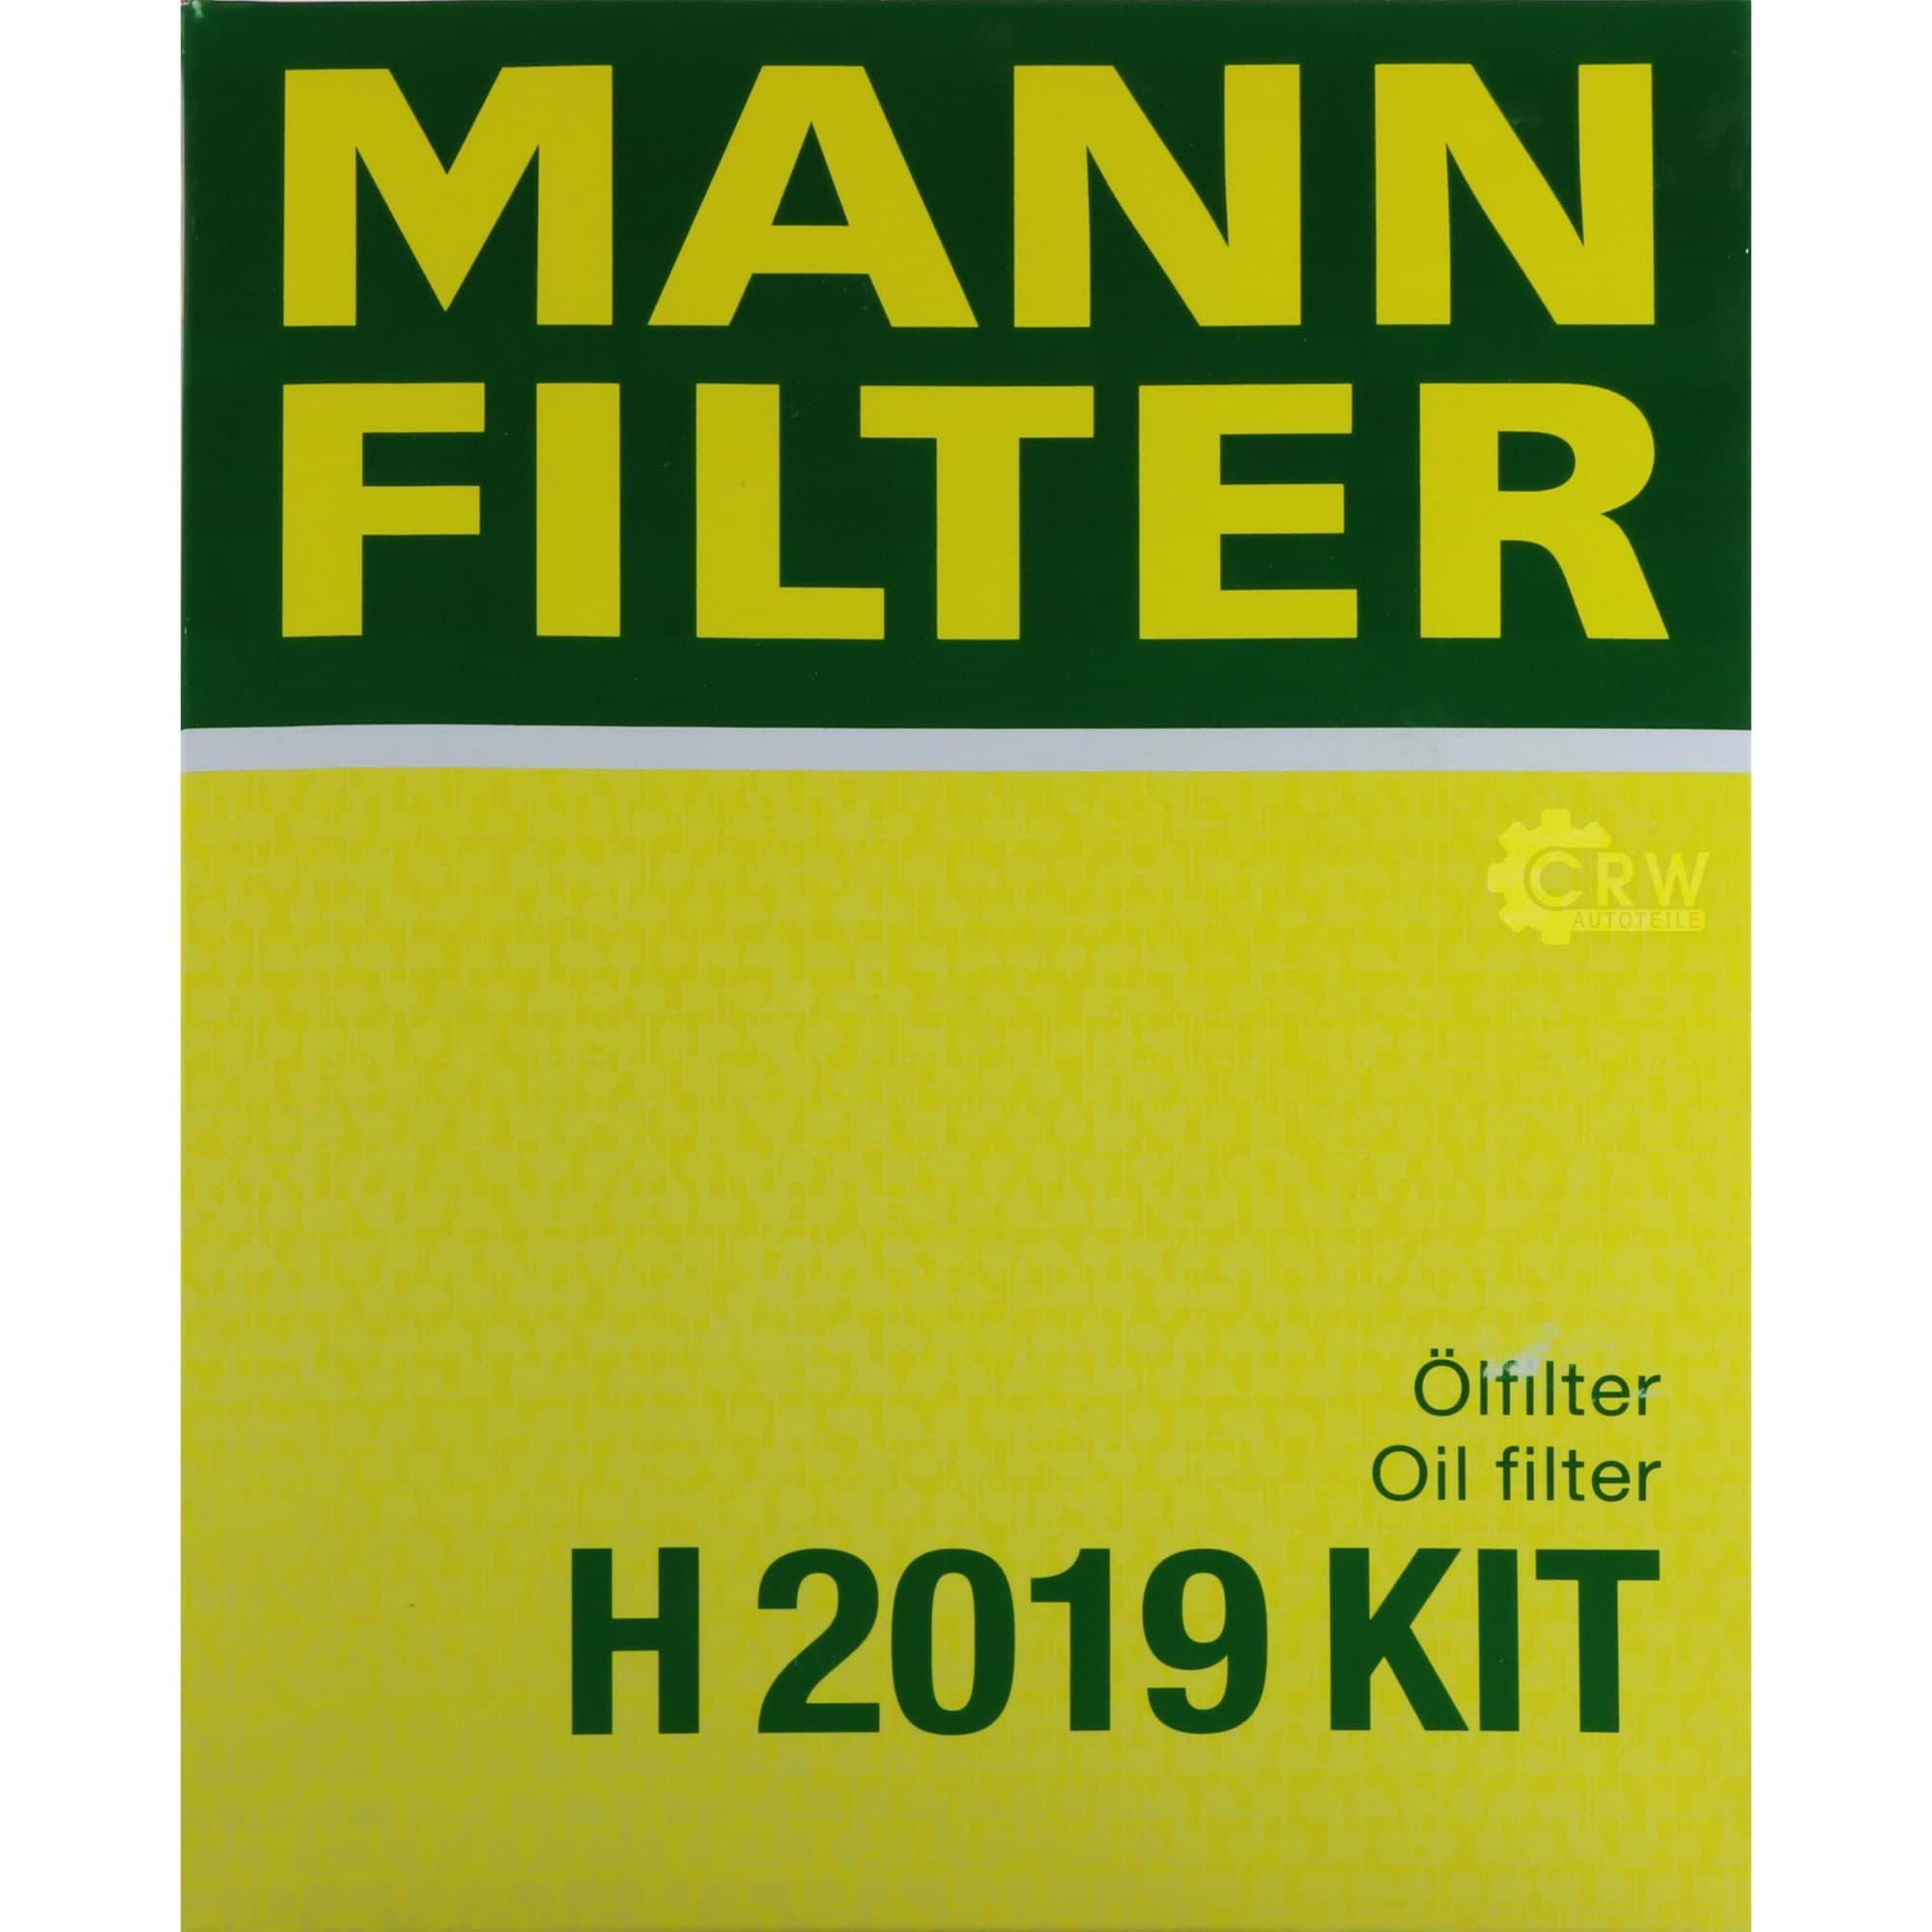 Mann H 2019 KIT Hydraulikfilter Automatikgetriebe für Audi Seat Skoda VW